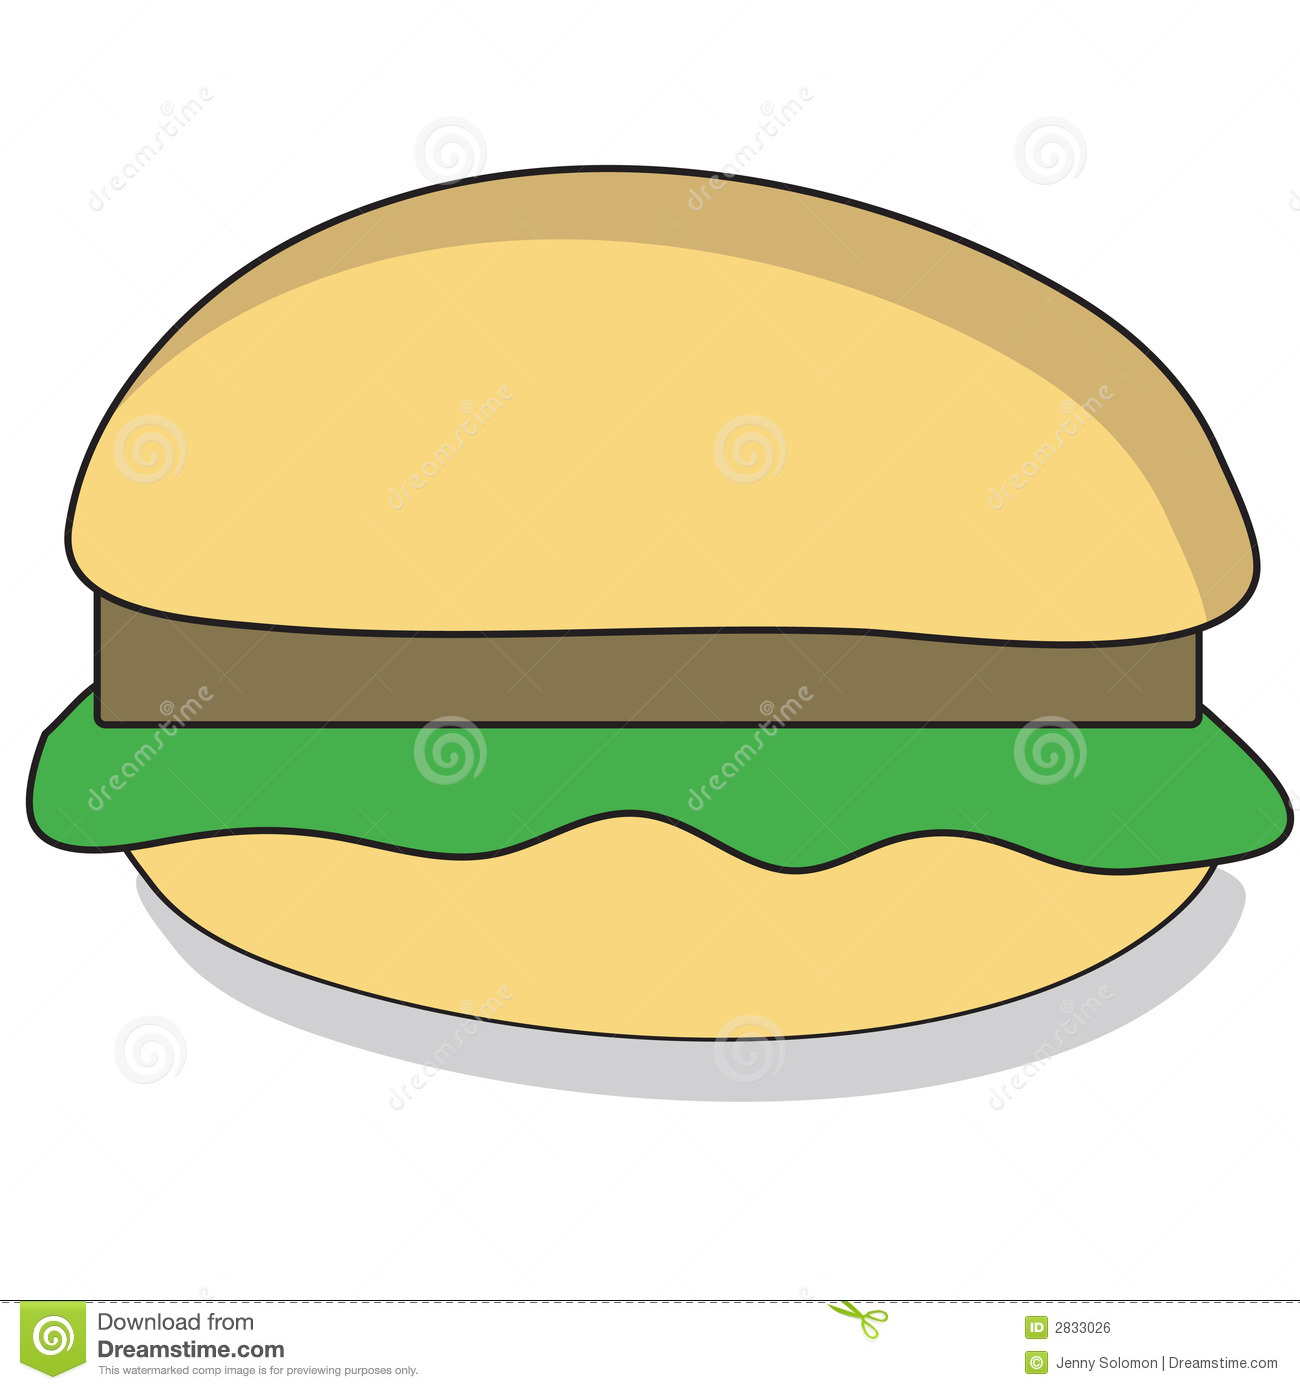 Cartoon Beefburger Royalty Free Stock Image.